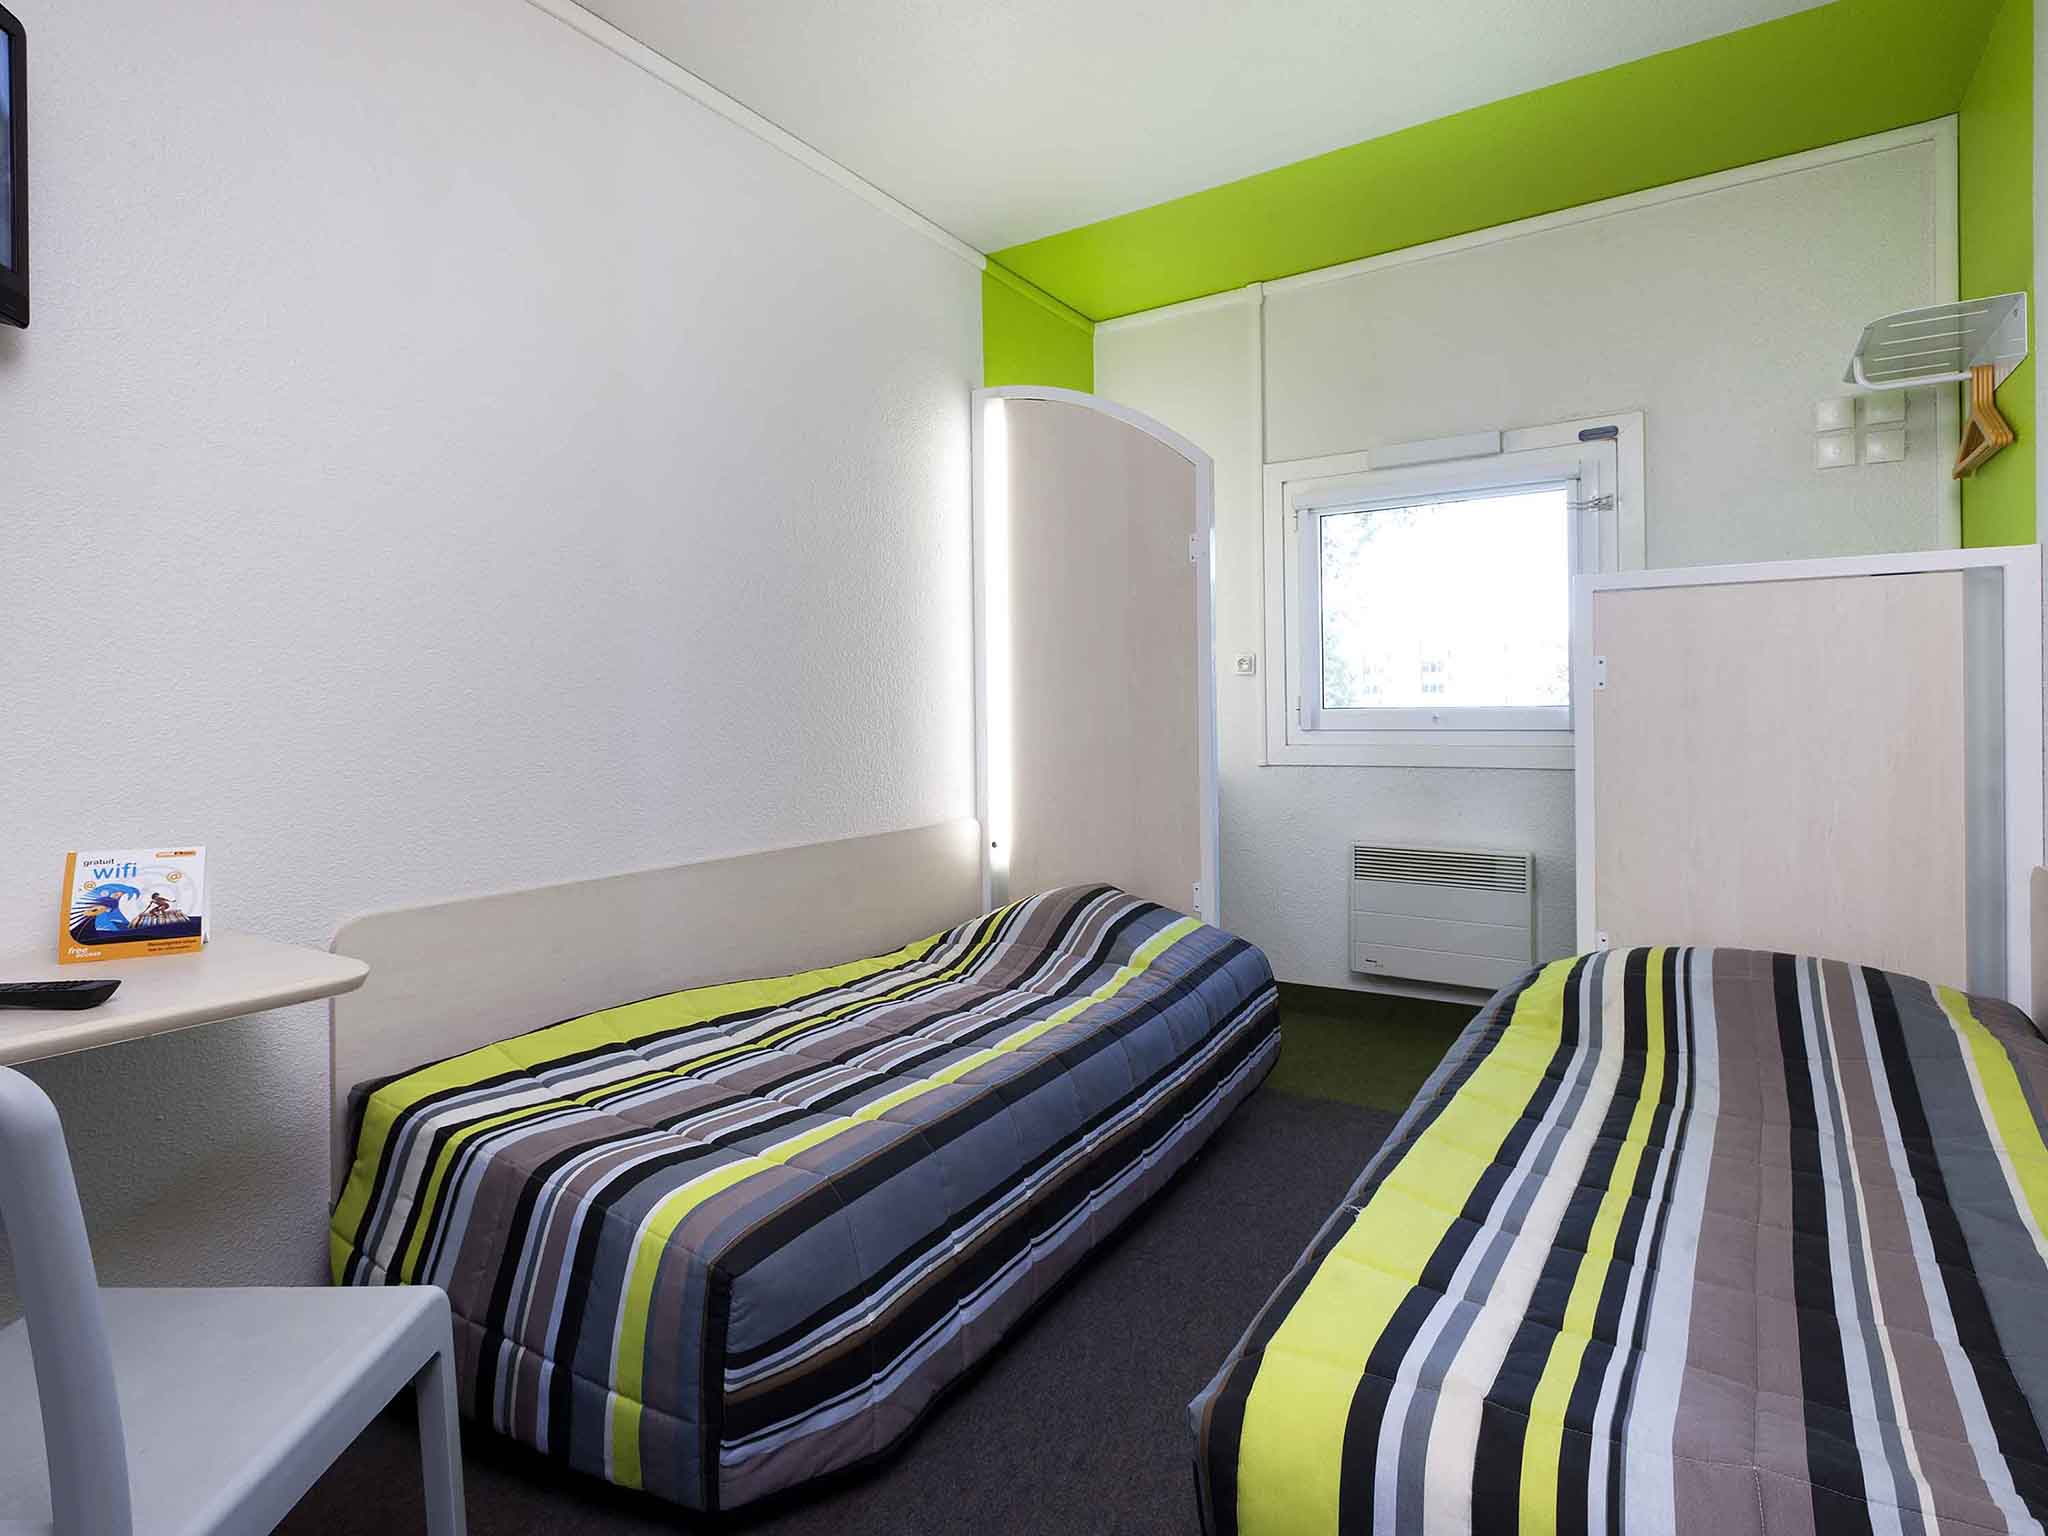 Hotel – hotelF1 Boulogne-sur-Mer